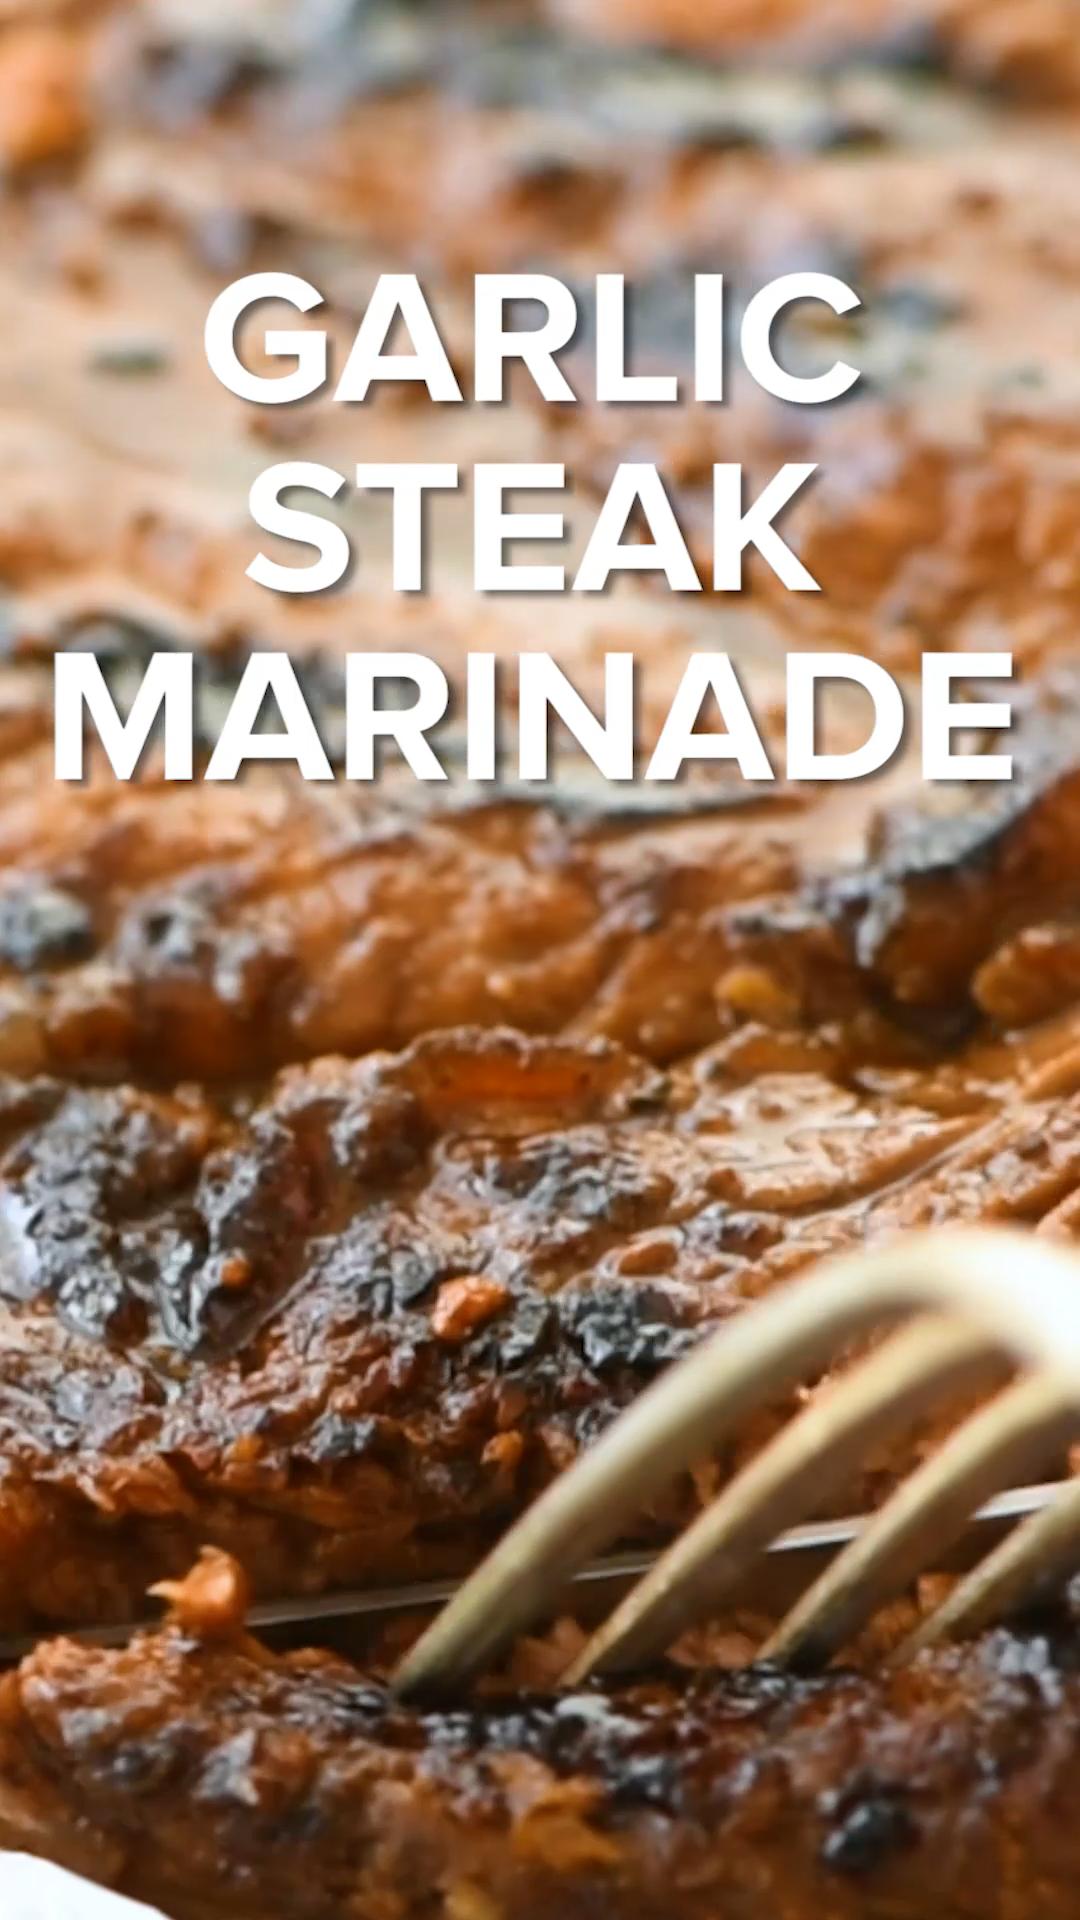 Garlic Steak Marinade Recipe images